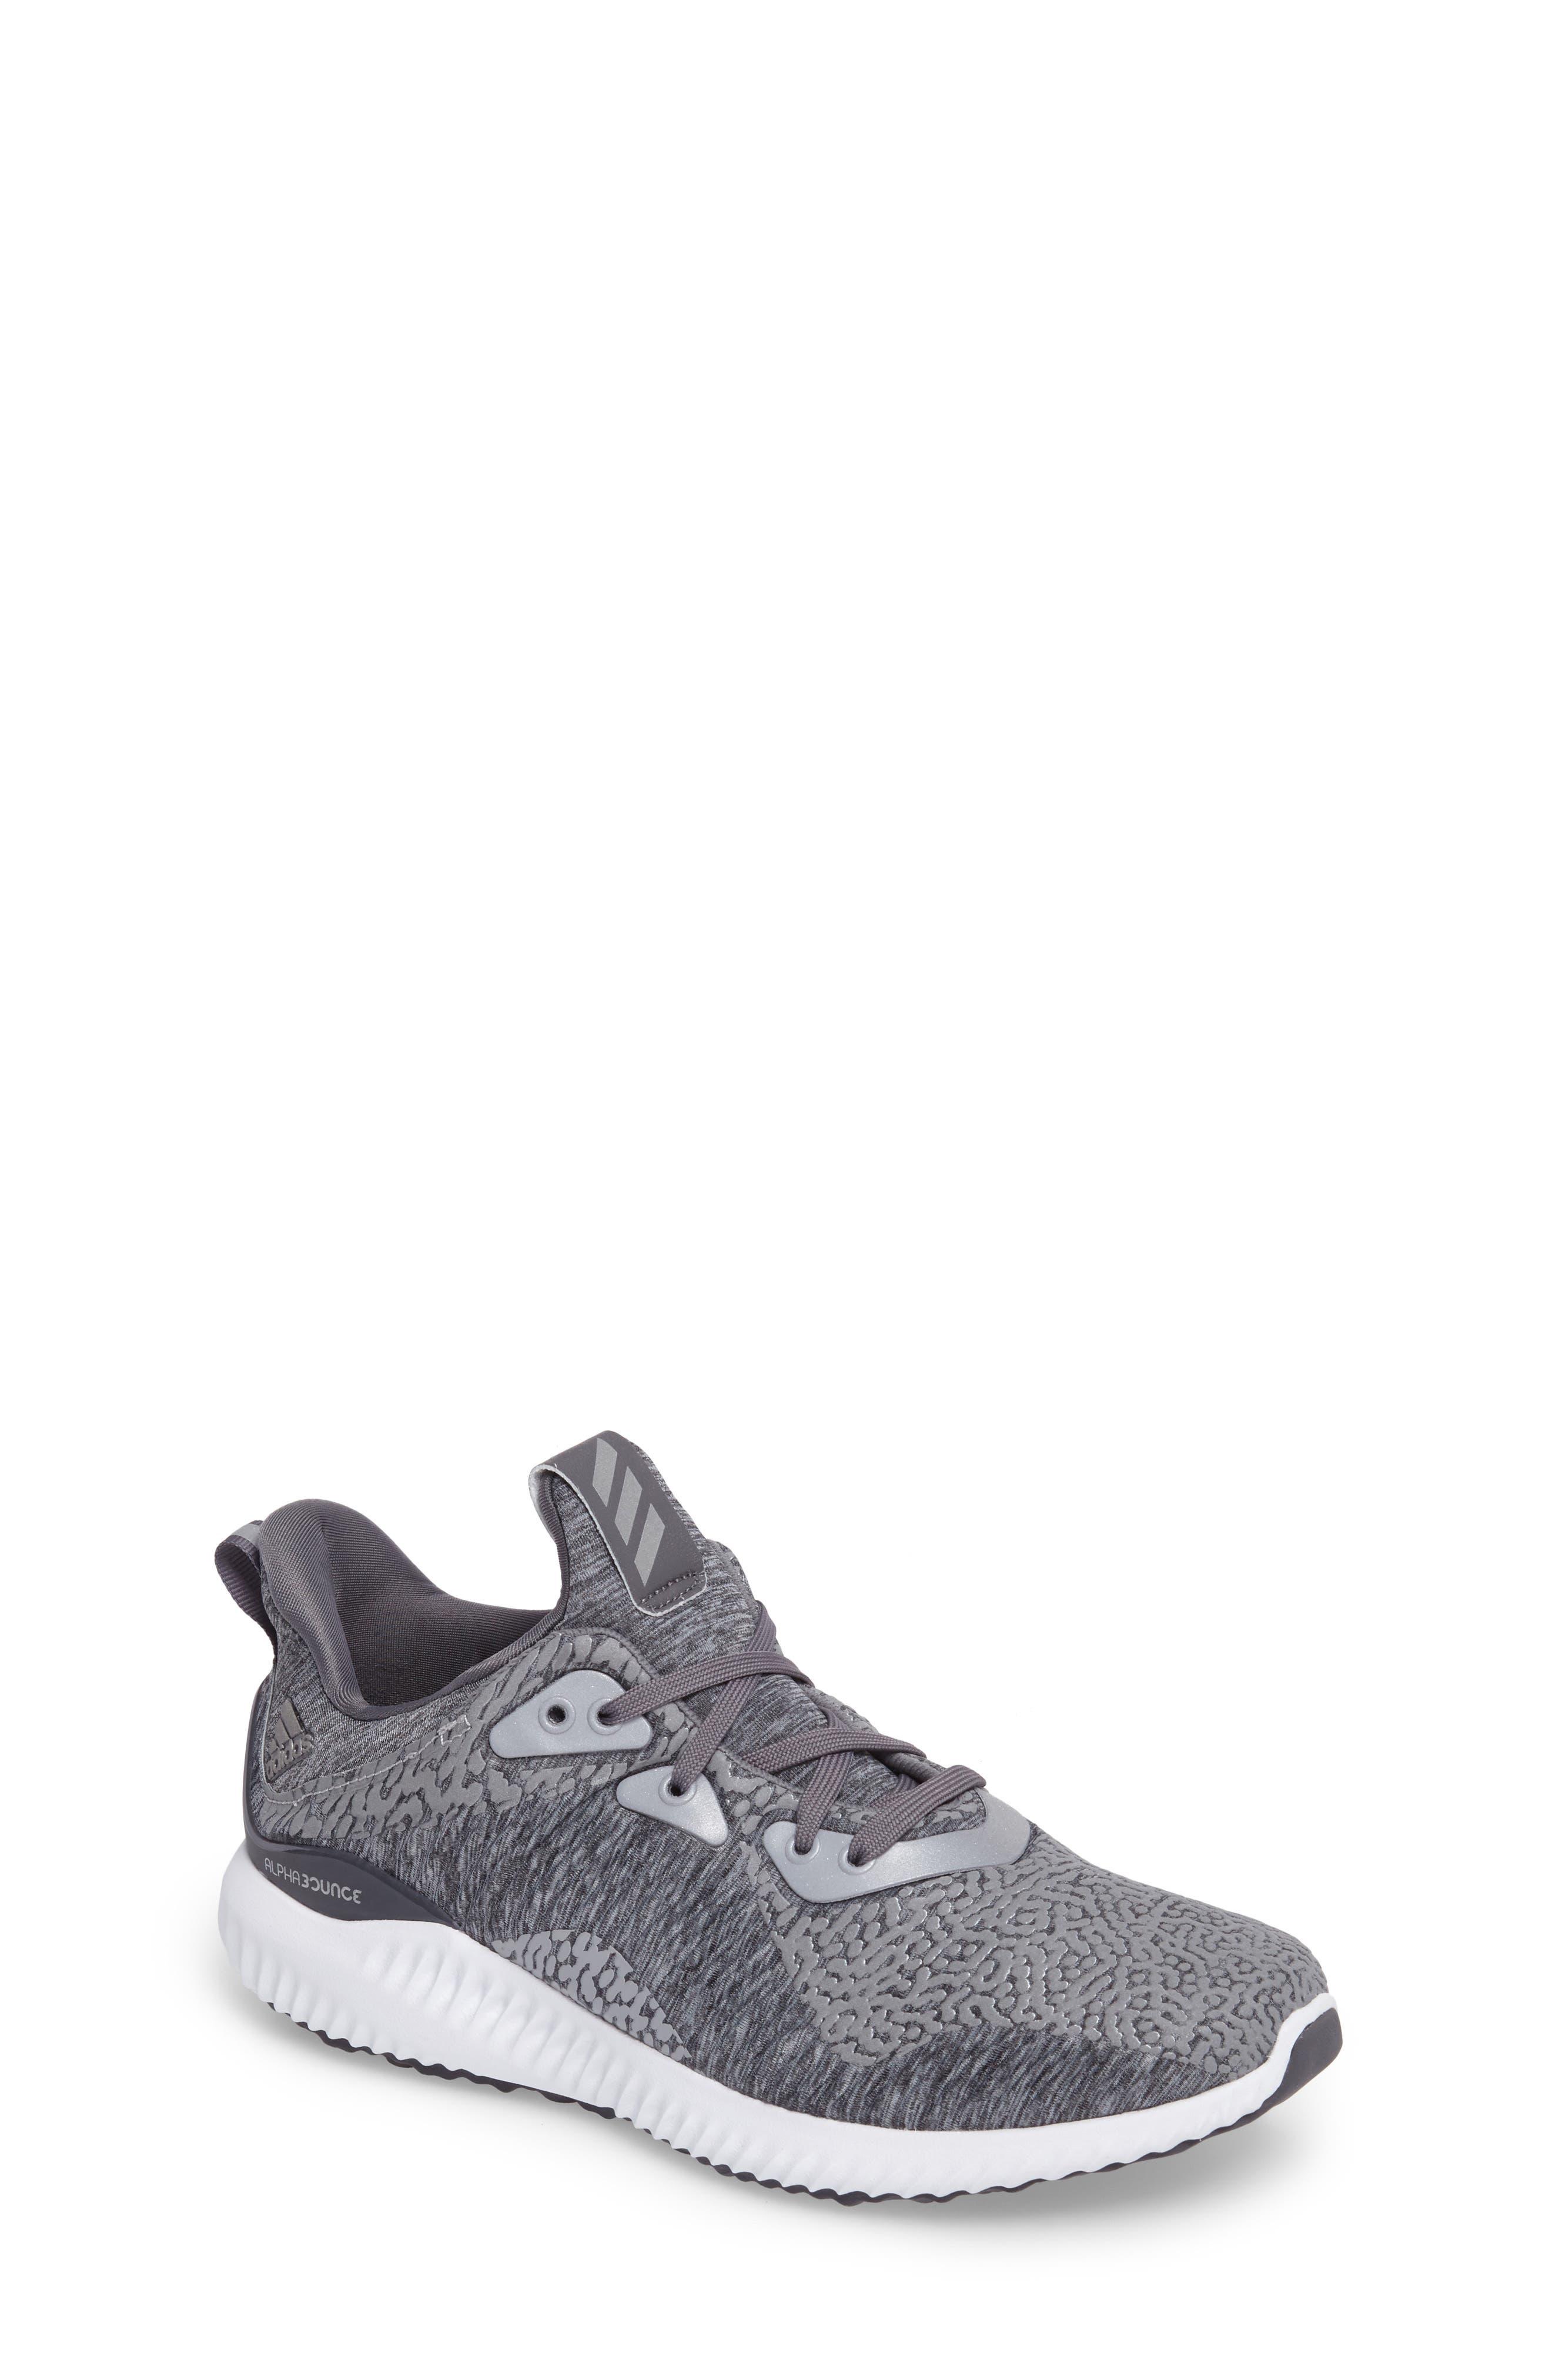 adidas AlphaBOUNCE Sneaker (Big Kid)